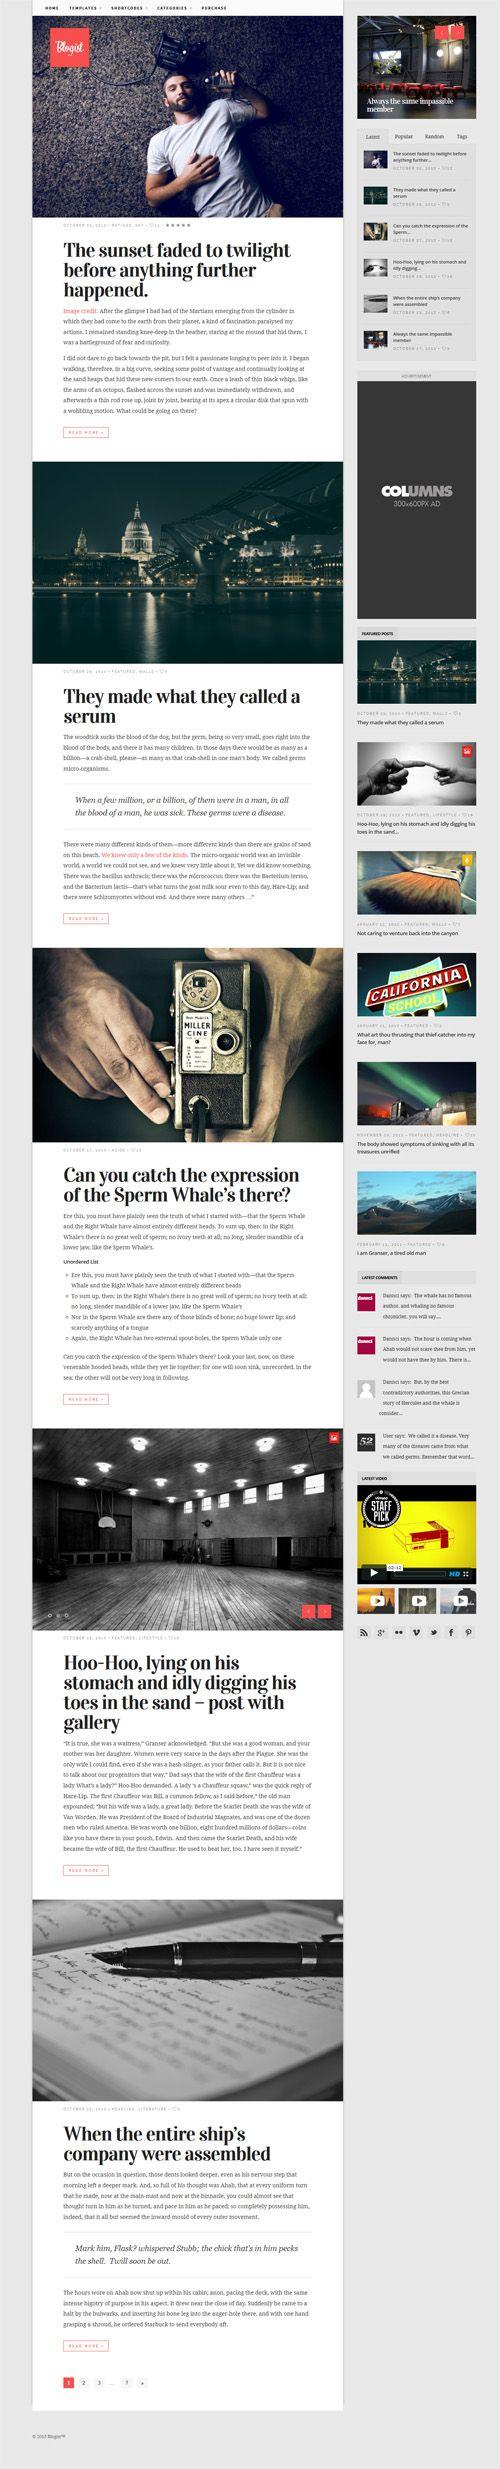 Blogist - Personal Blog theme  #wordpressthemes #responsivedesign #preimumwordpessthemes